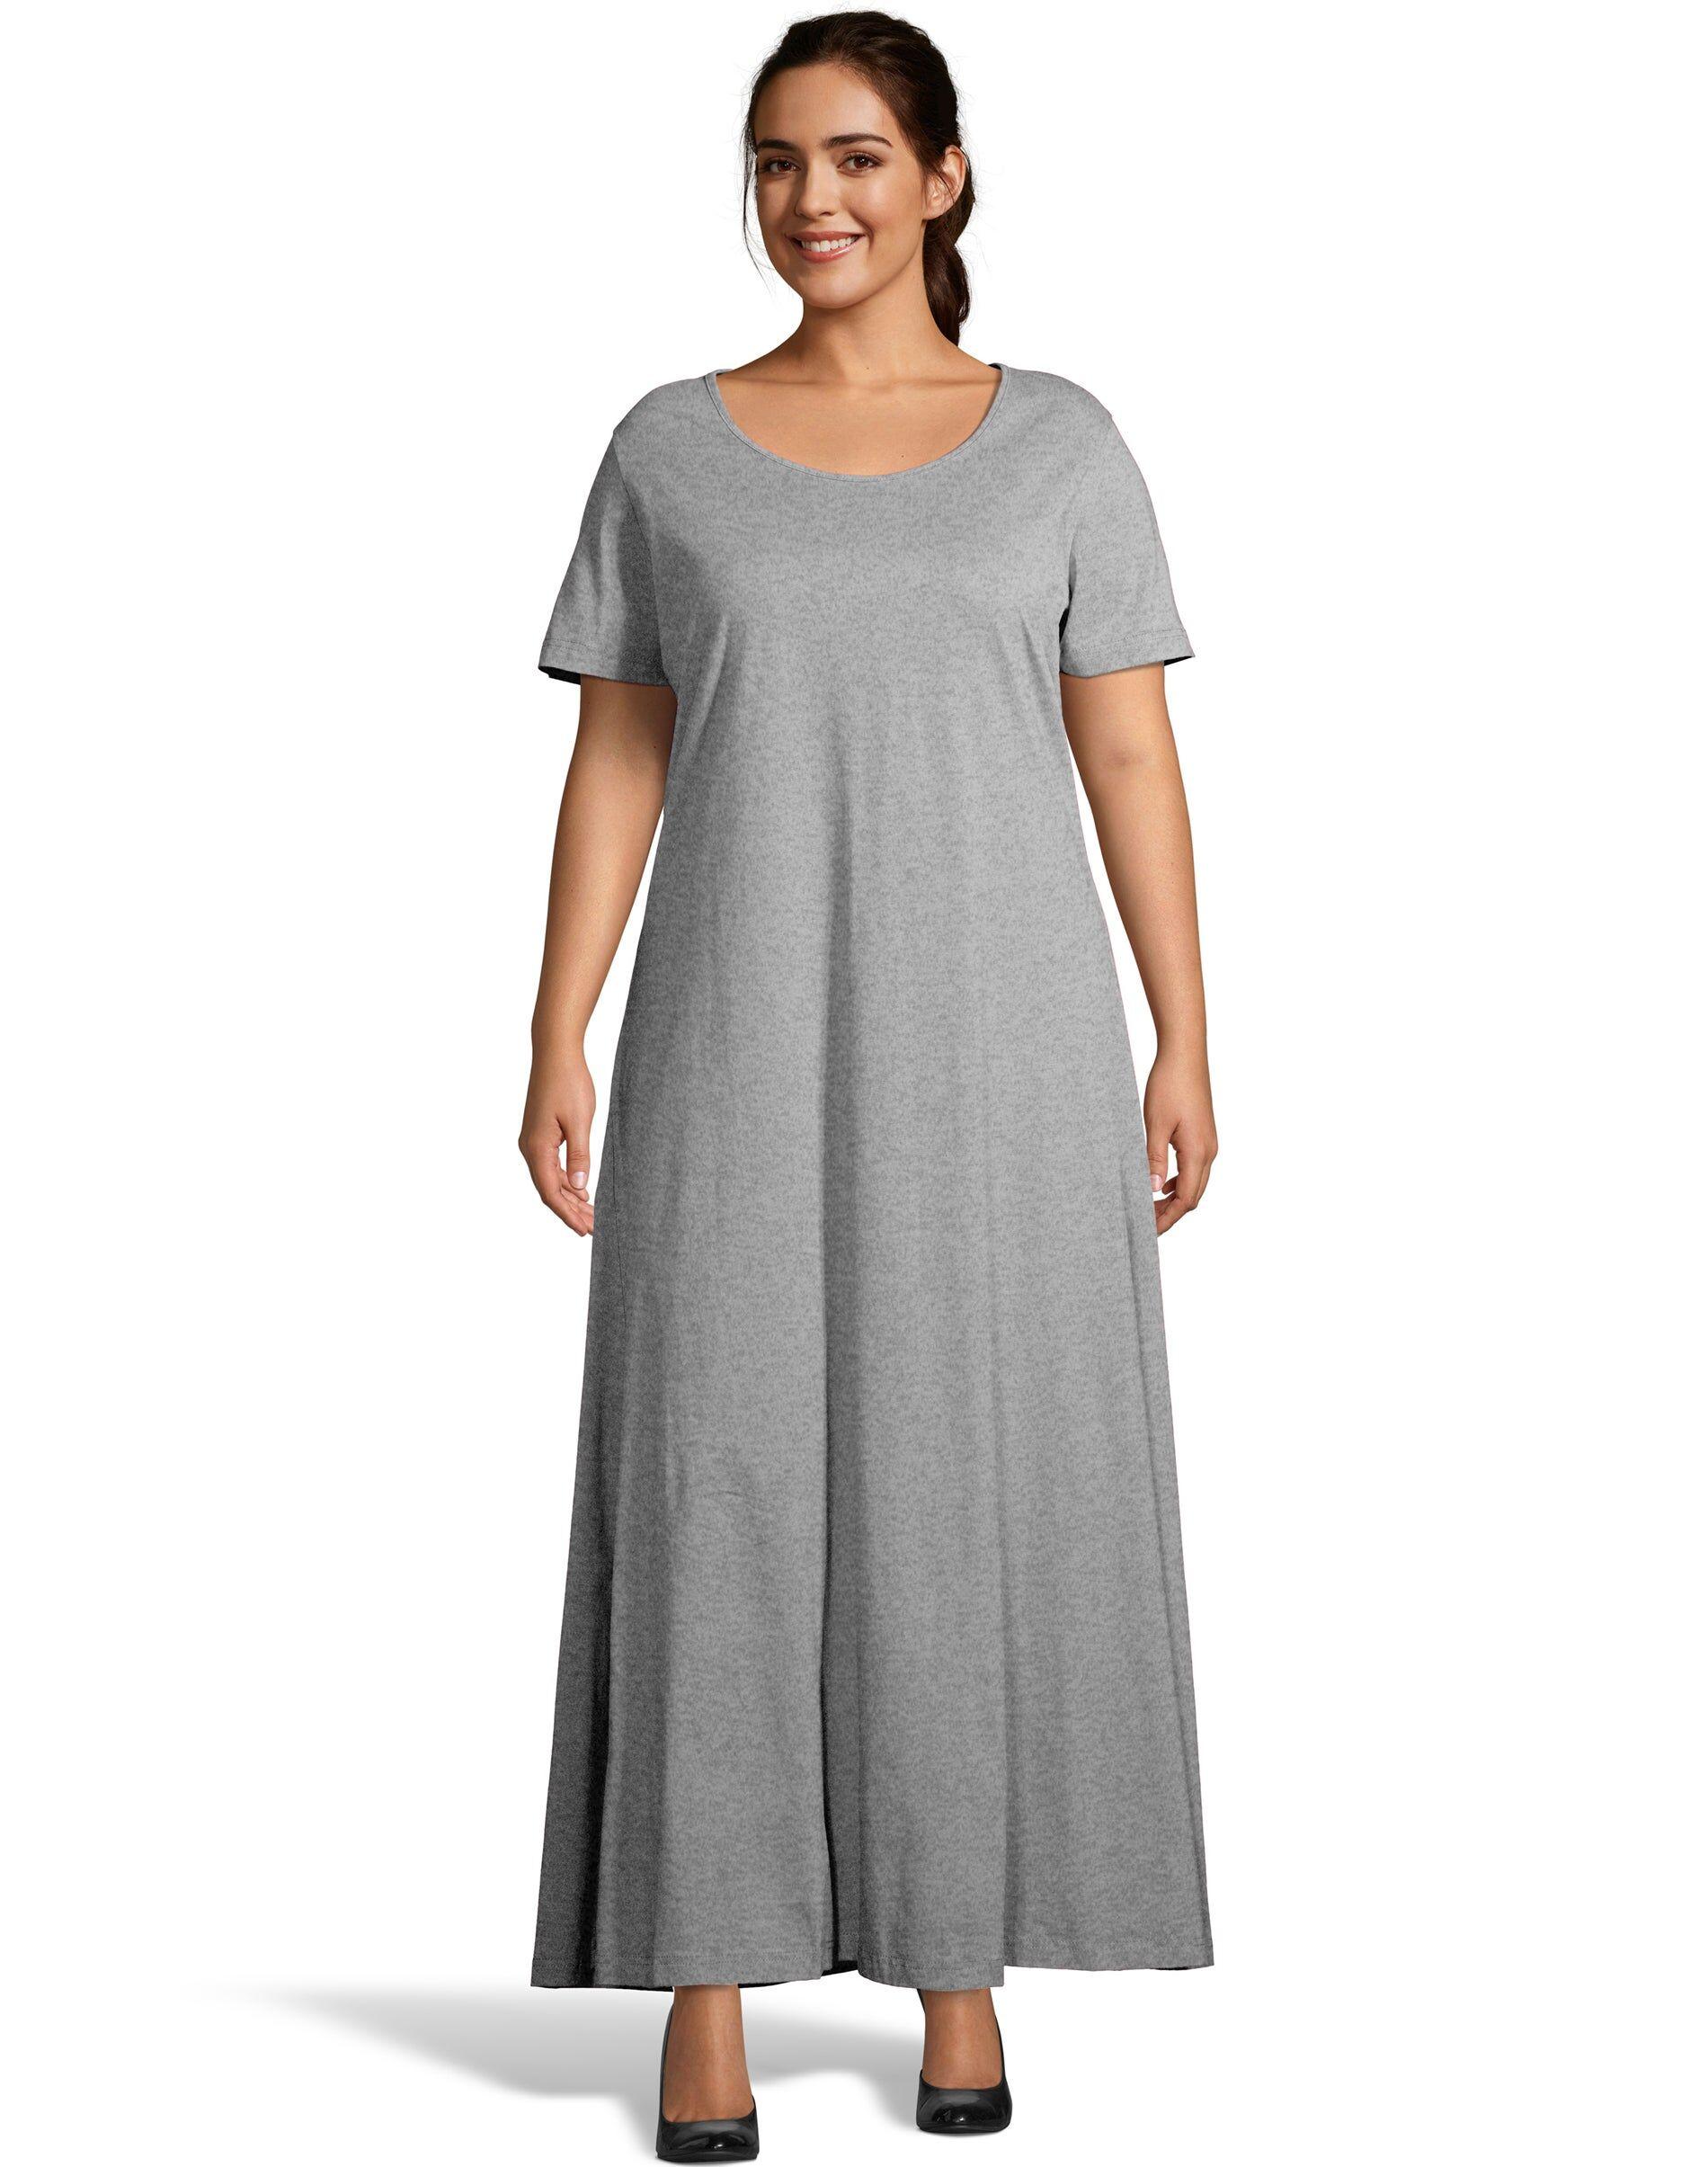 Just My Size Jersey Matchables Maxi Dress Grey Heather 3X Women's